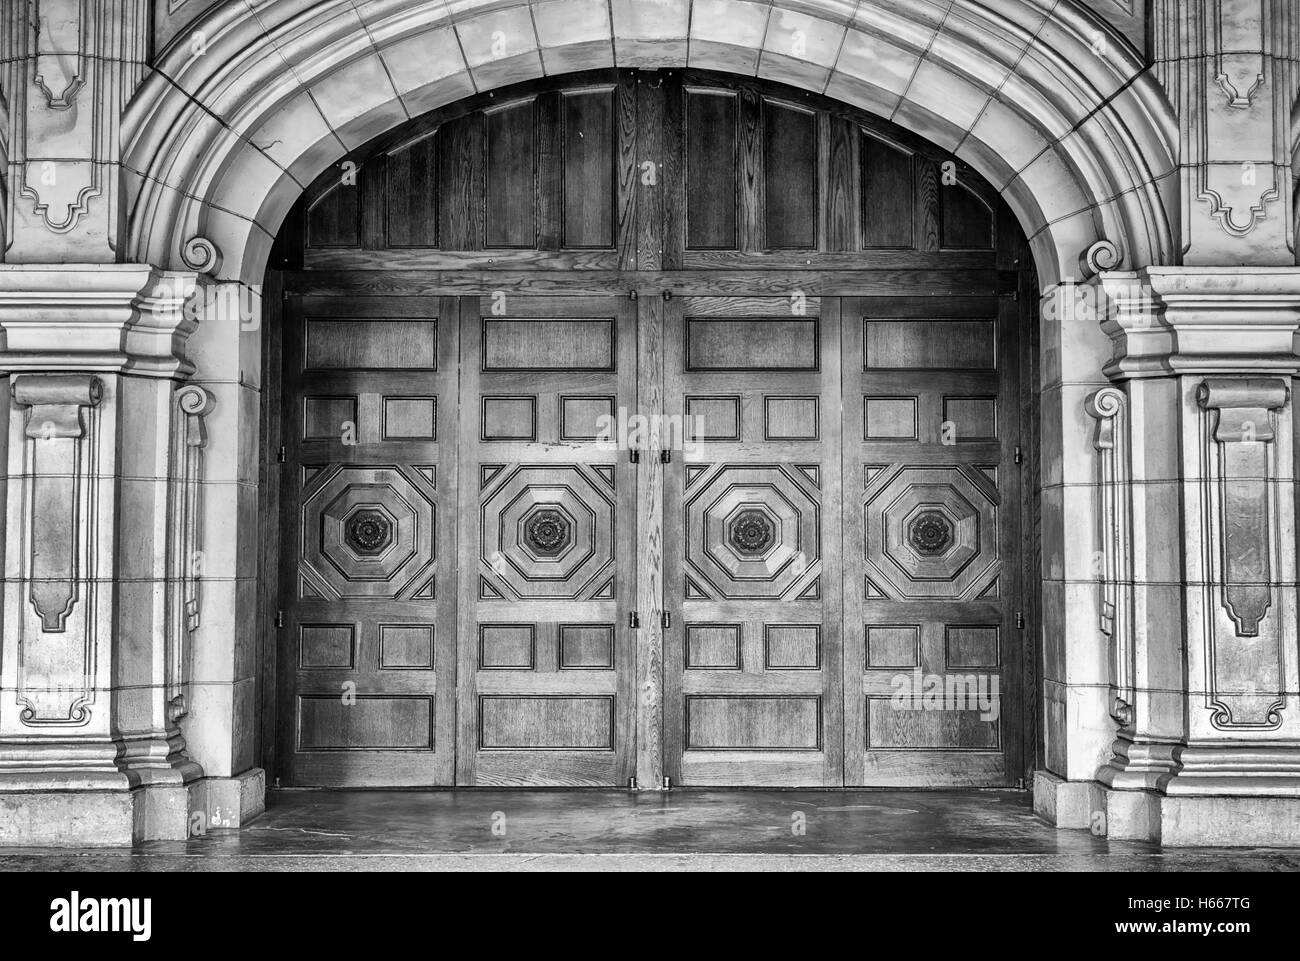 wooden doors concrete arch. Balboa Park San Diego California USA Stock Photo 124298400 - Alamy & wooden doors concrete arch. Balboa Park San Diego California USA ...